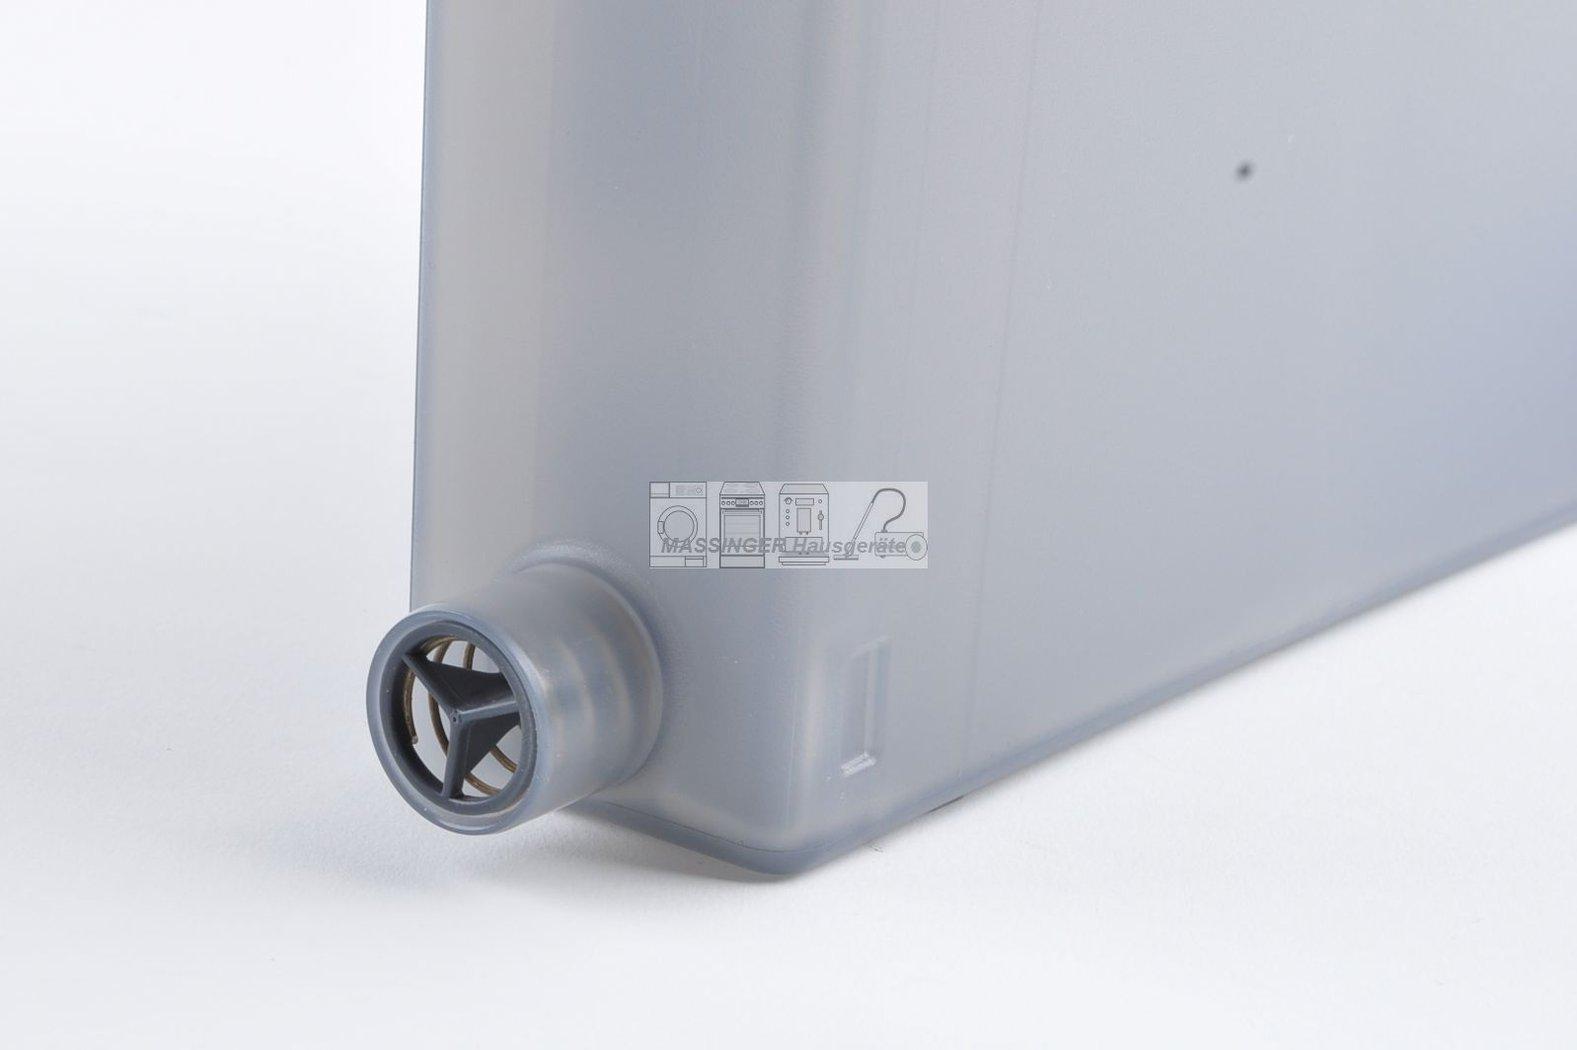 Wassertank neff bosch siemens dampfgarer 00791032 for Siemens dampfgarer